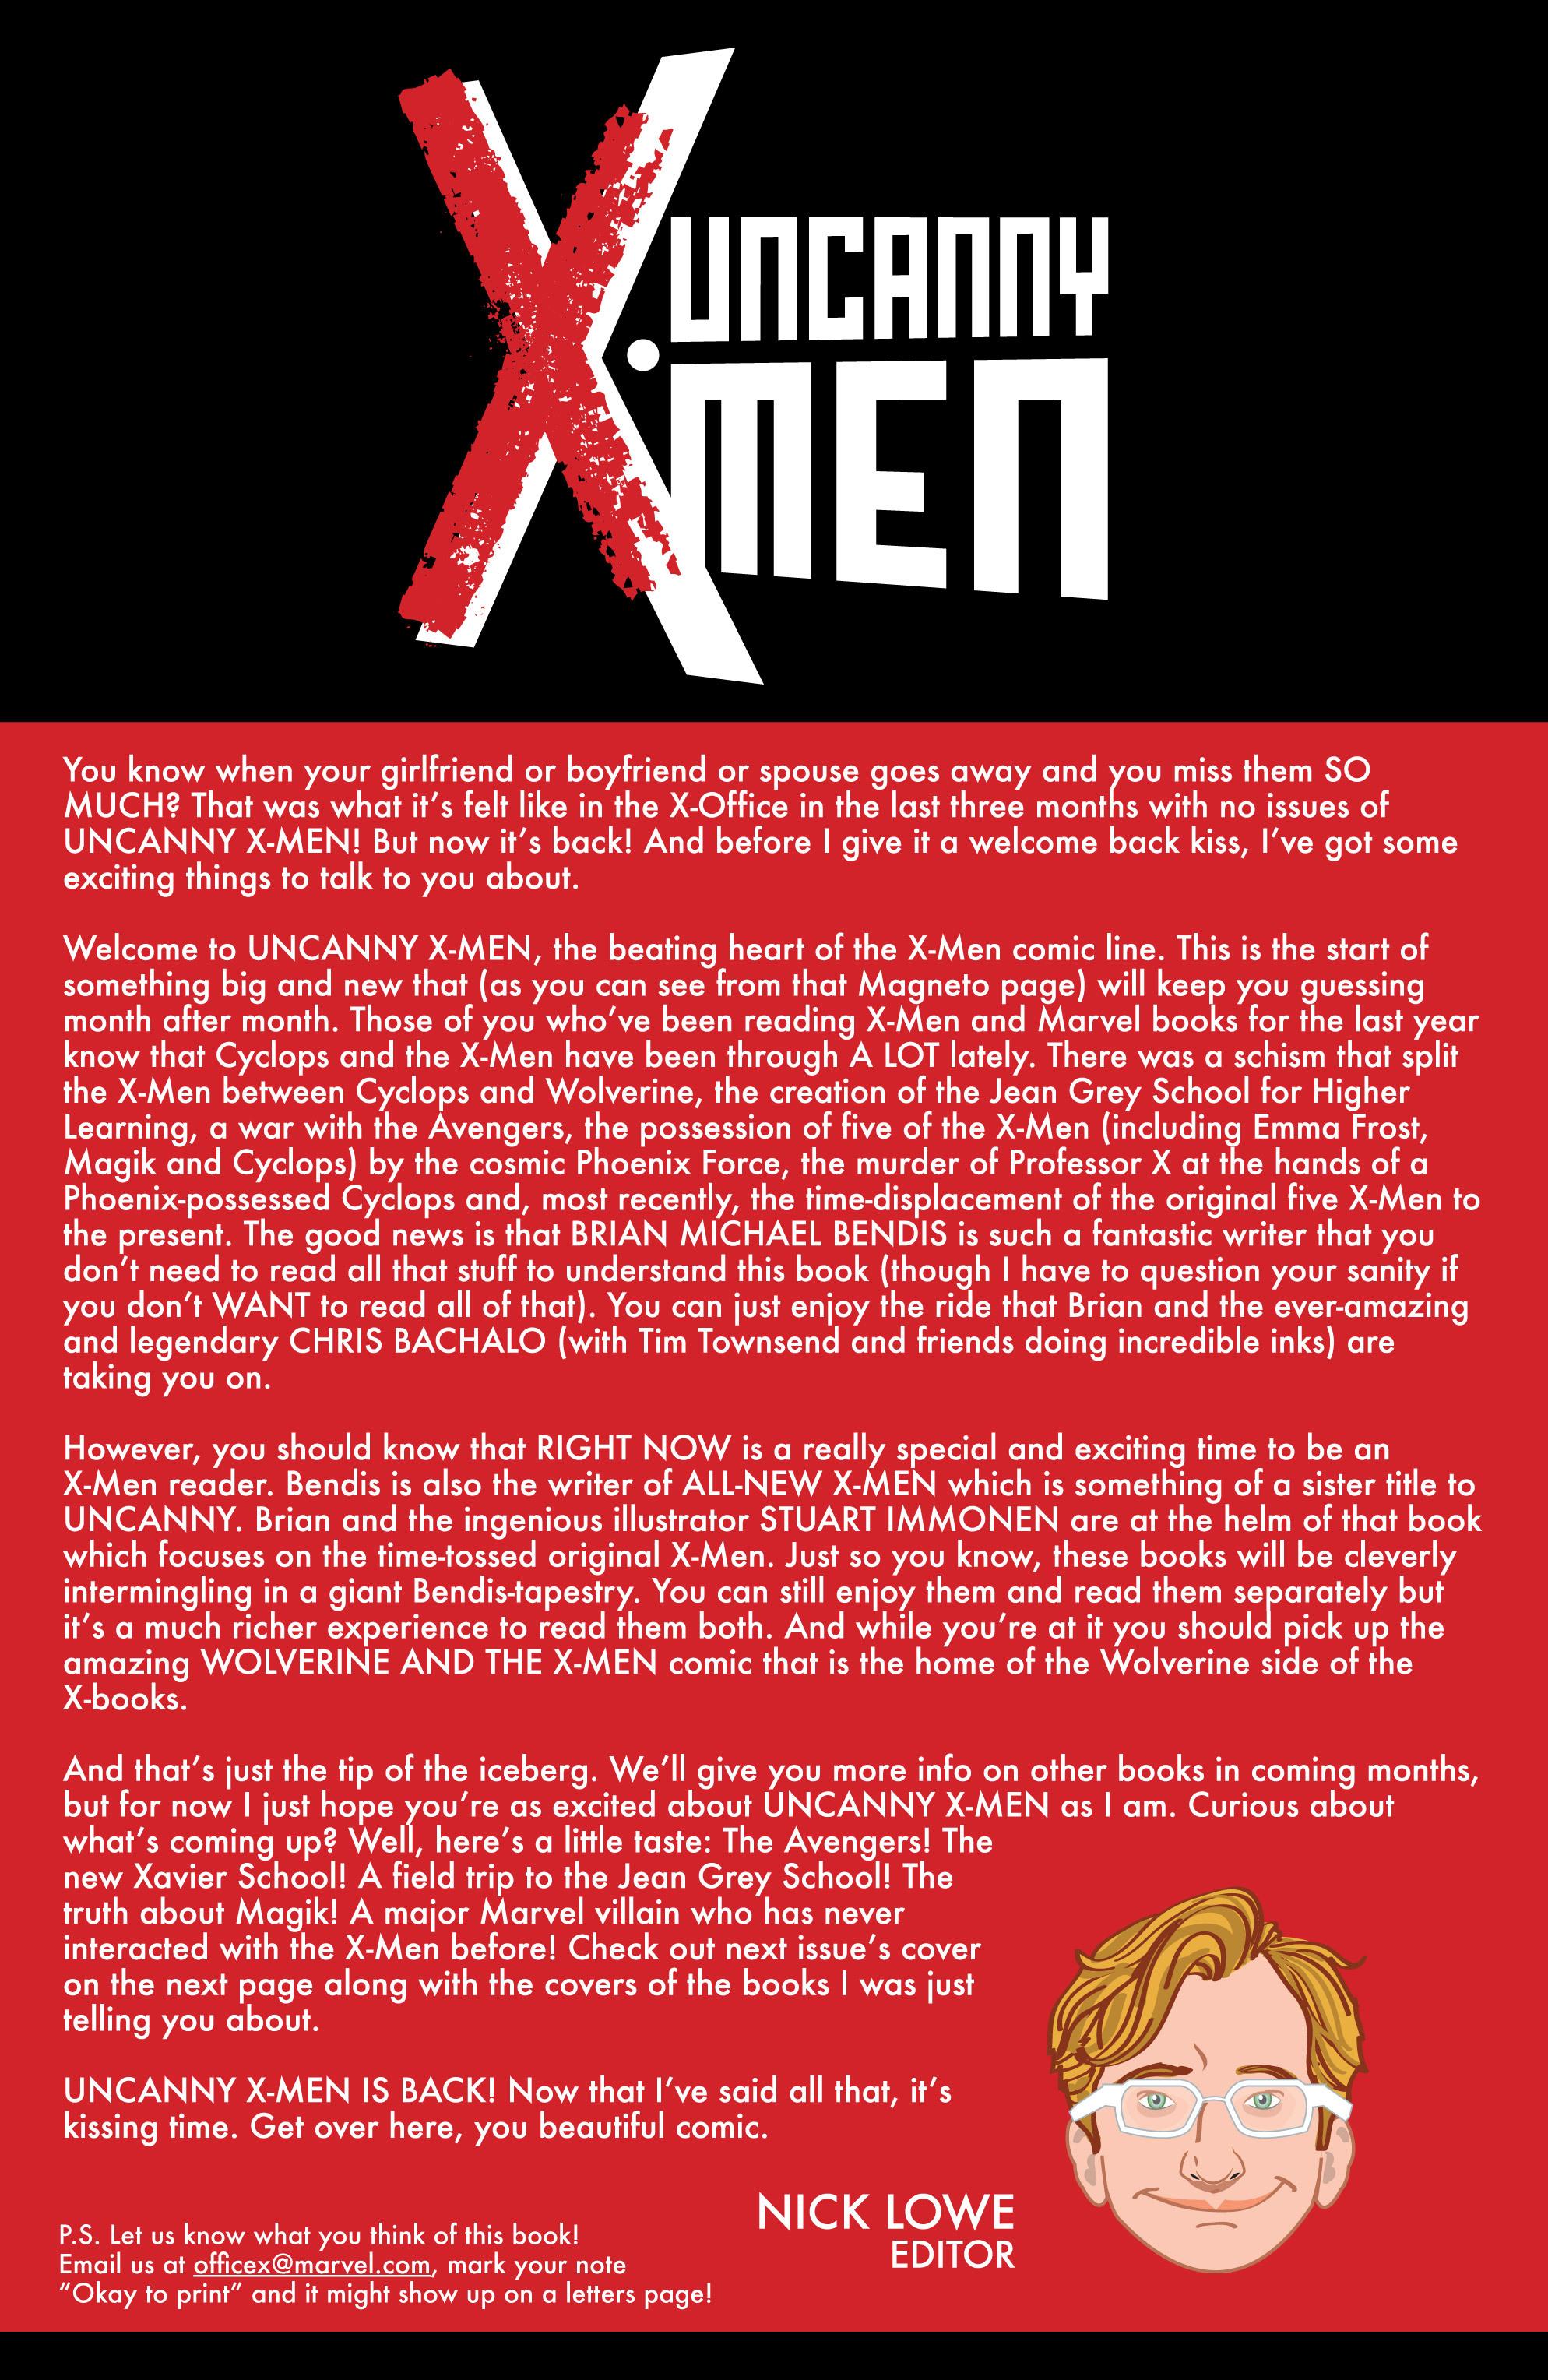 Read online Uncanny X-Men (2013) comic -  Issue # _TPB 1 - Revolution - 23